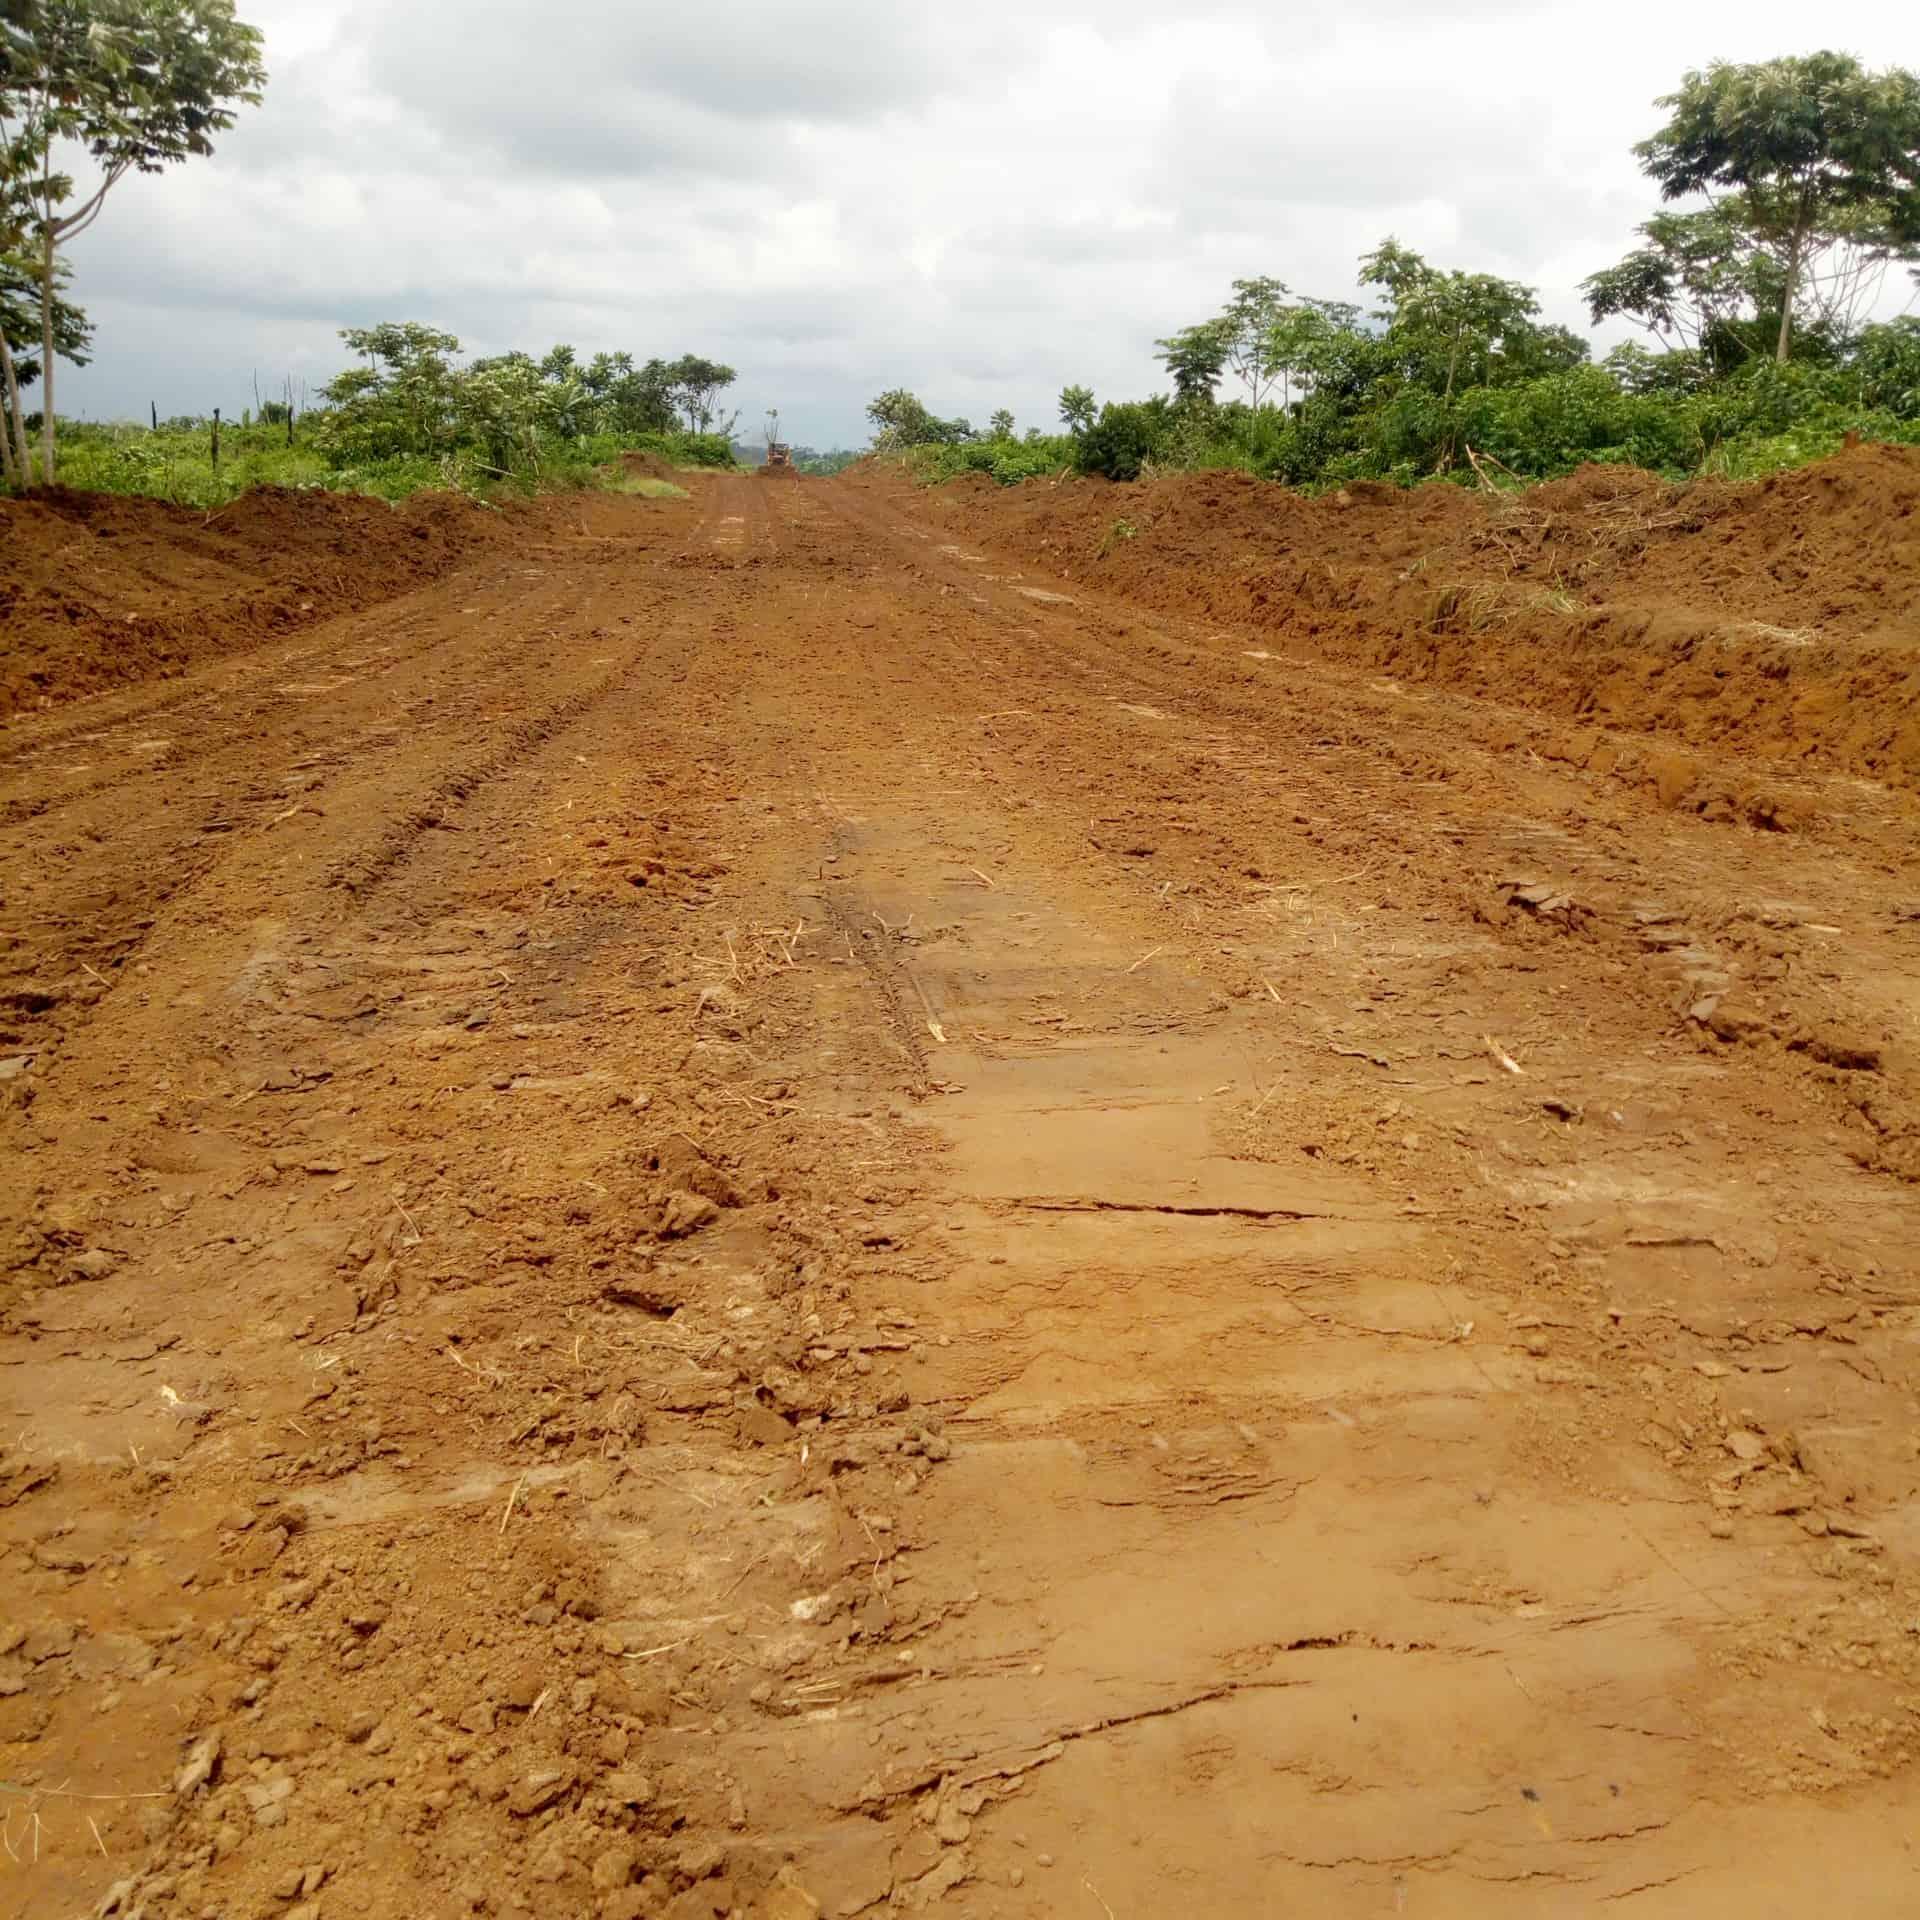 Land for sale at Yaoundé, Nyom, nyom - 1000 m2 - 13 000 000 FCFA